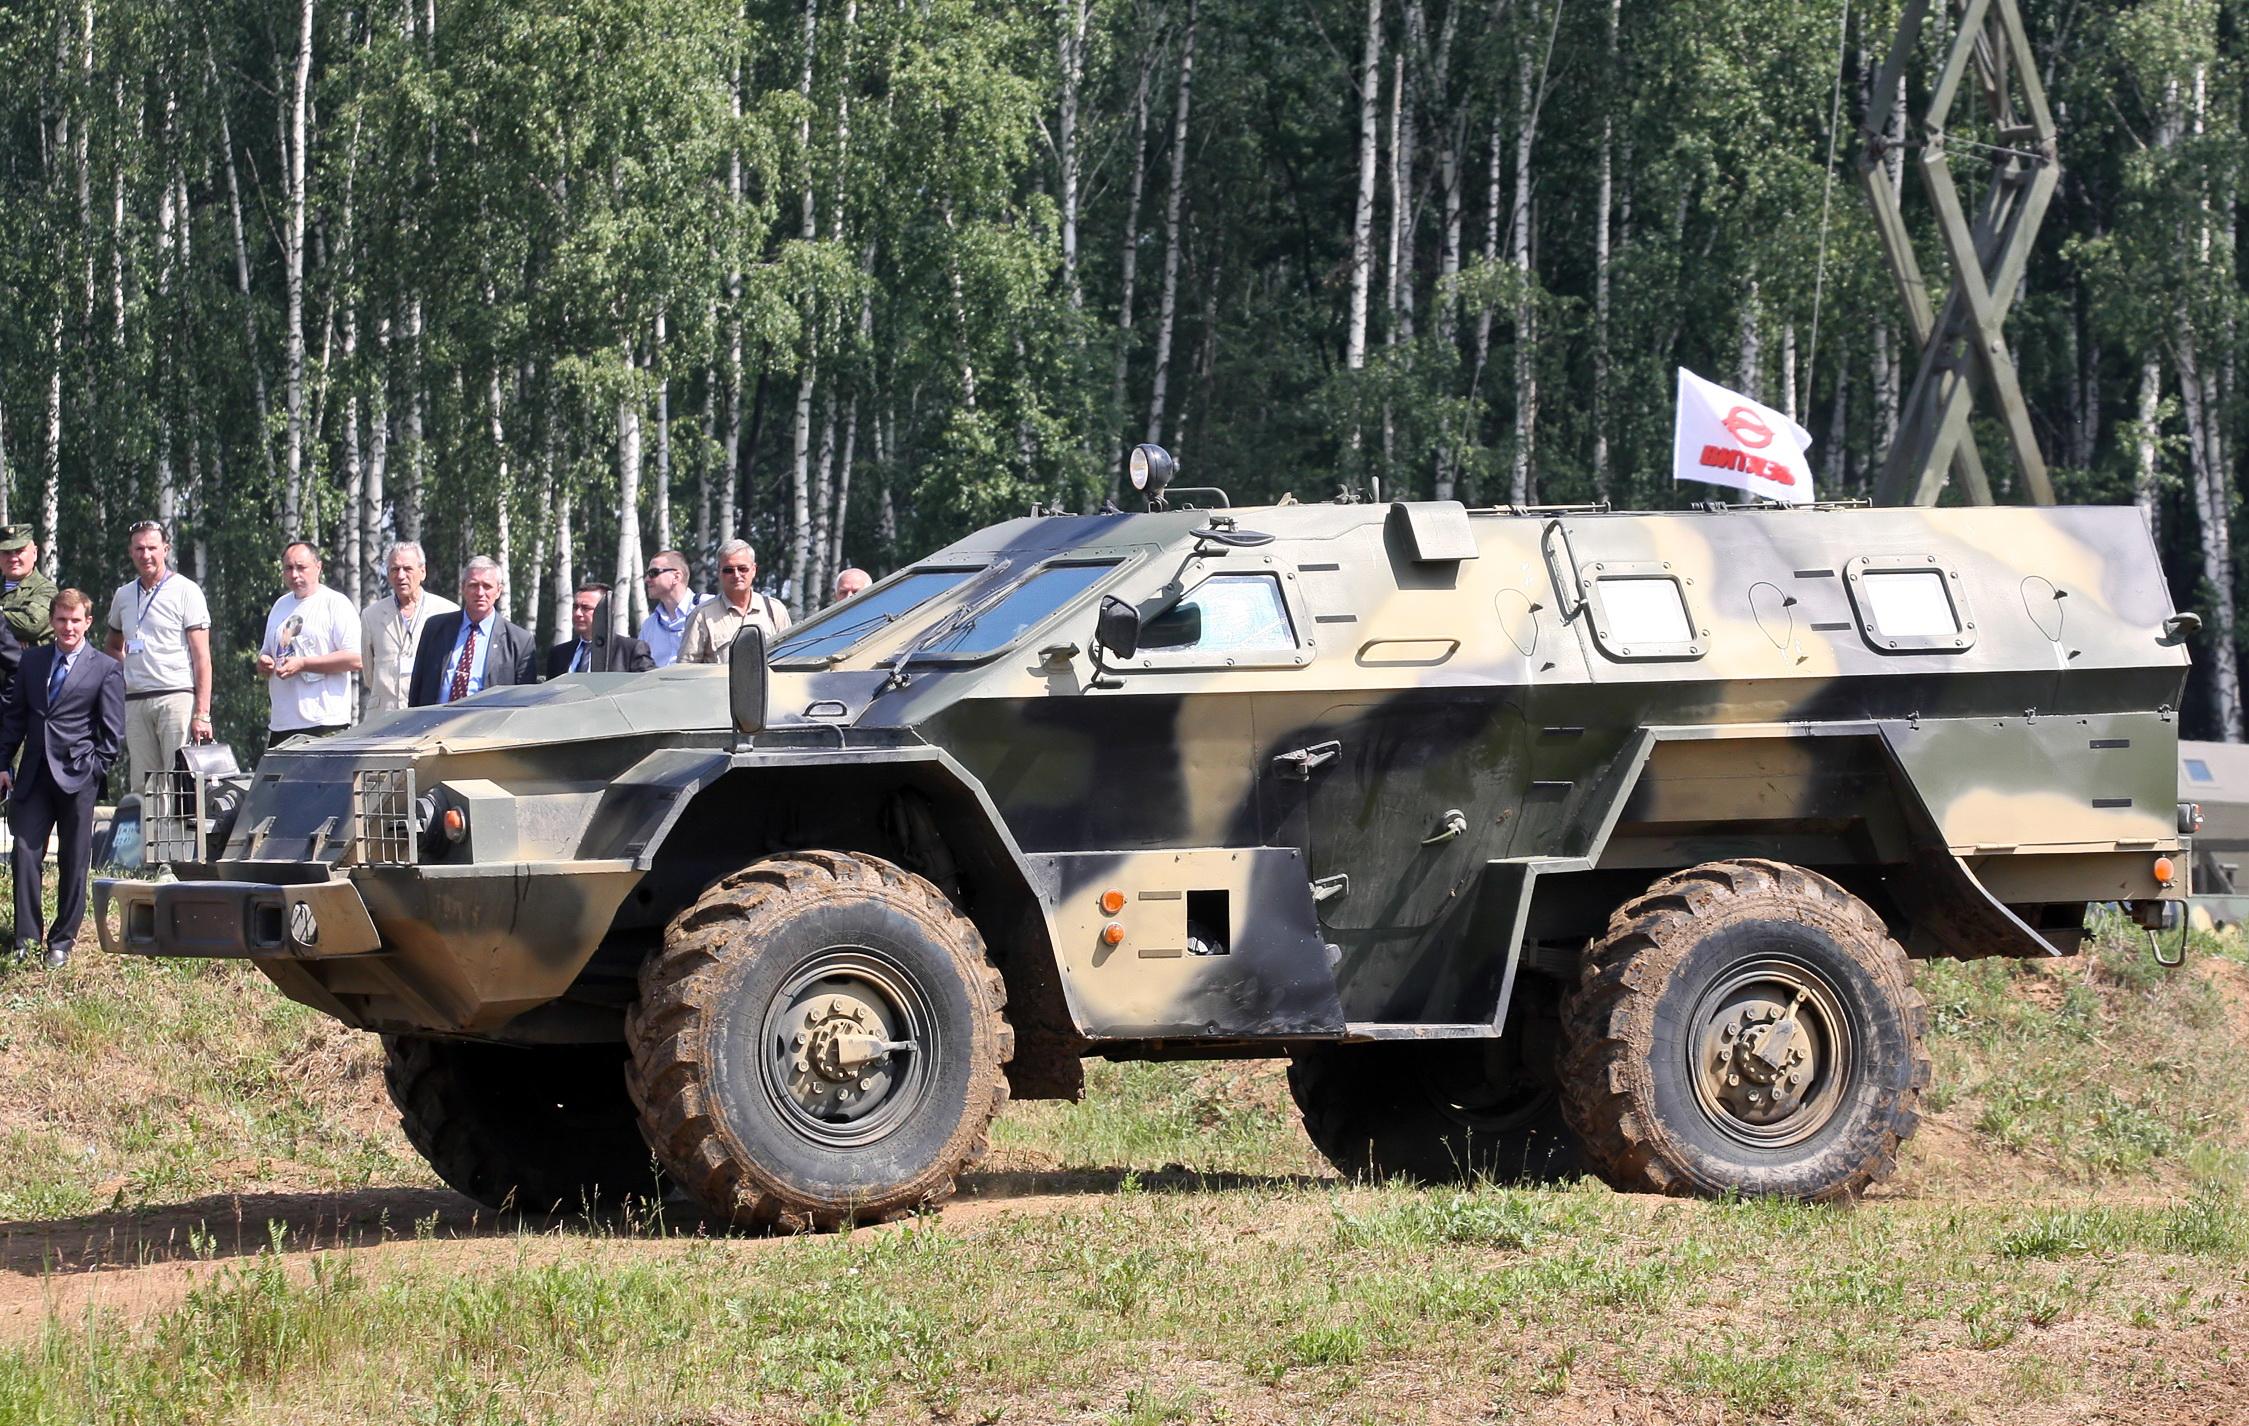 http://upload.wikimedia.org/wikipedia/commons/e/e1/KAMAZ-43269_Vystrel_Bronnitsy024.jpg?uselang=ru